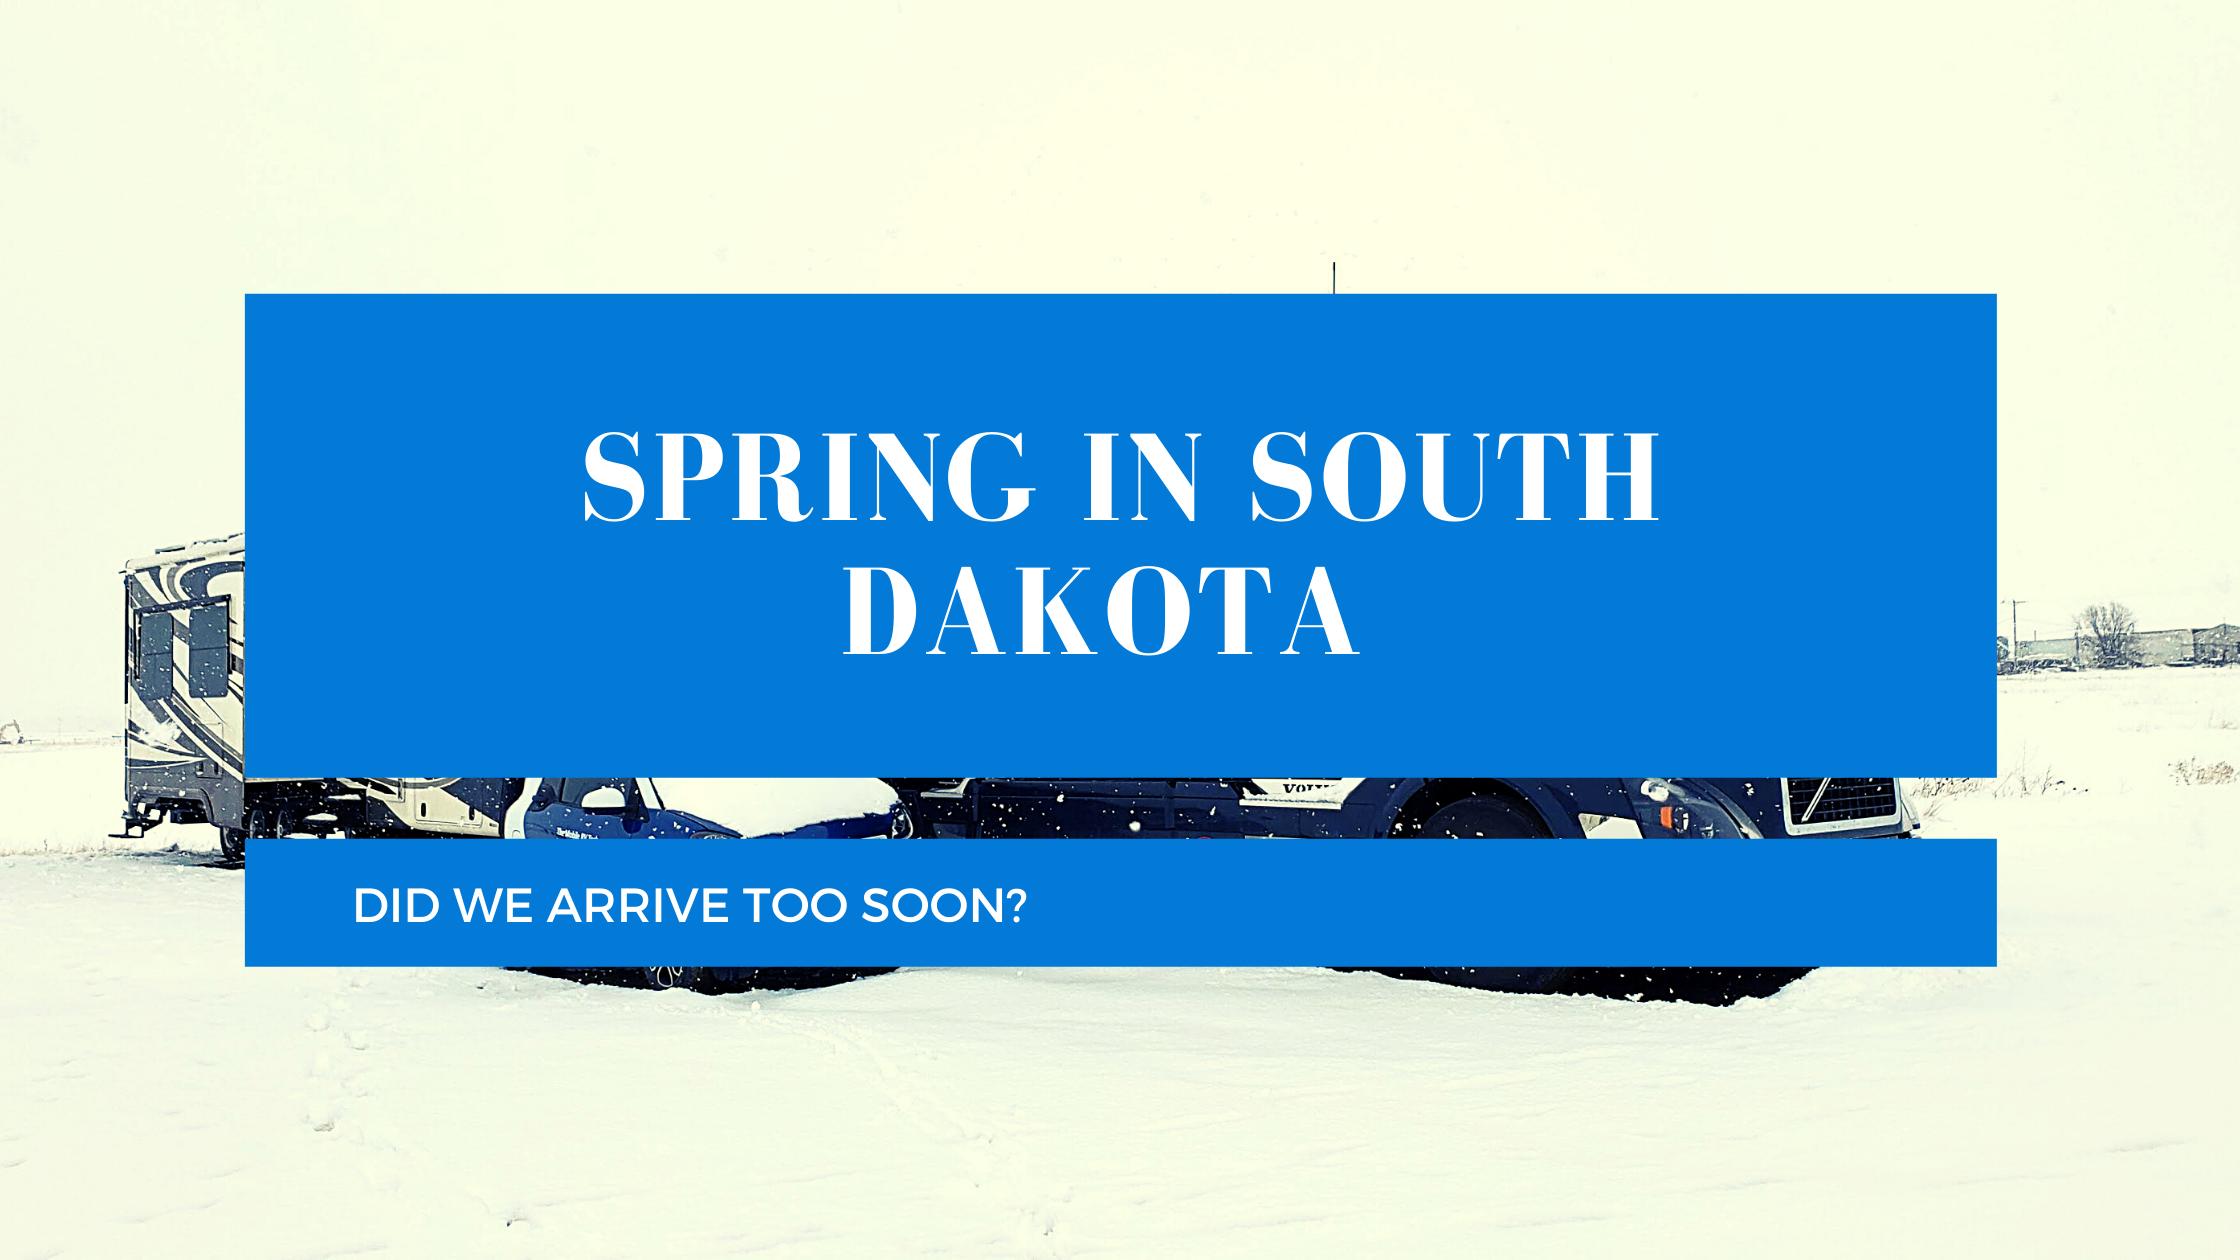 Spring in South Dakota - Arrived too Soon?